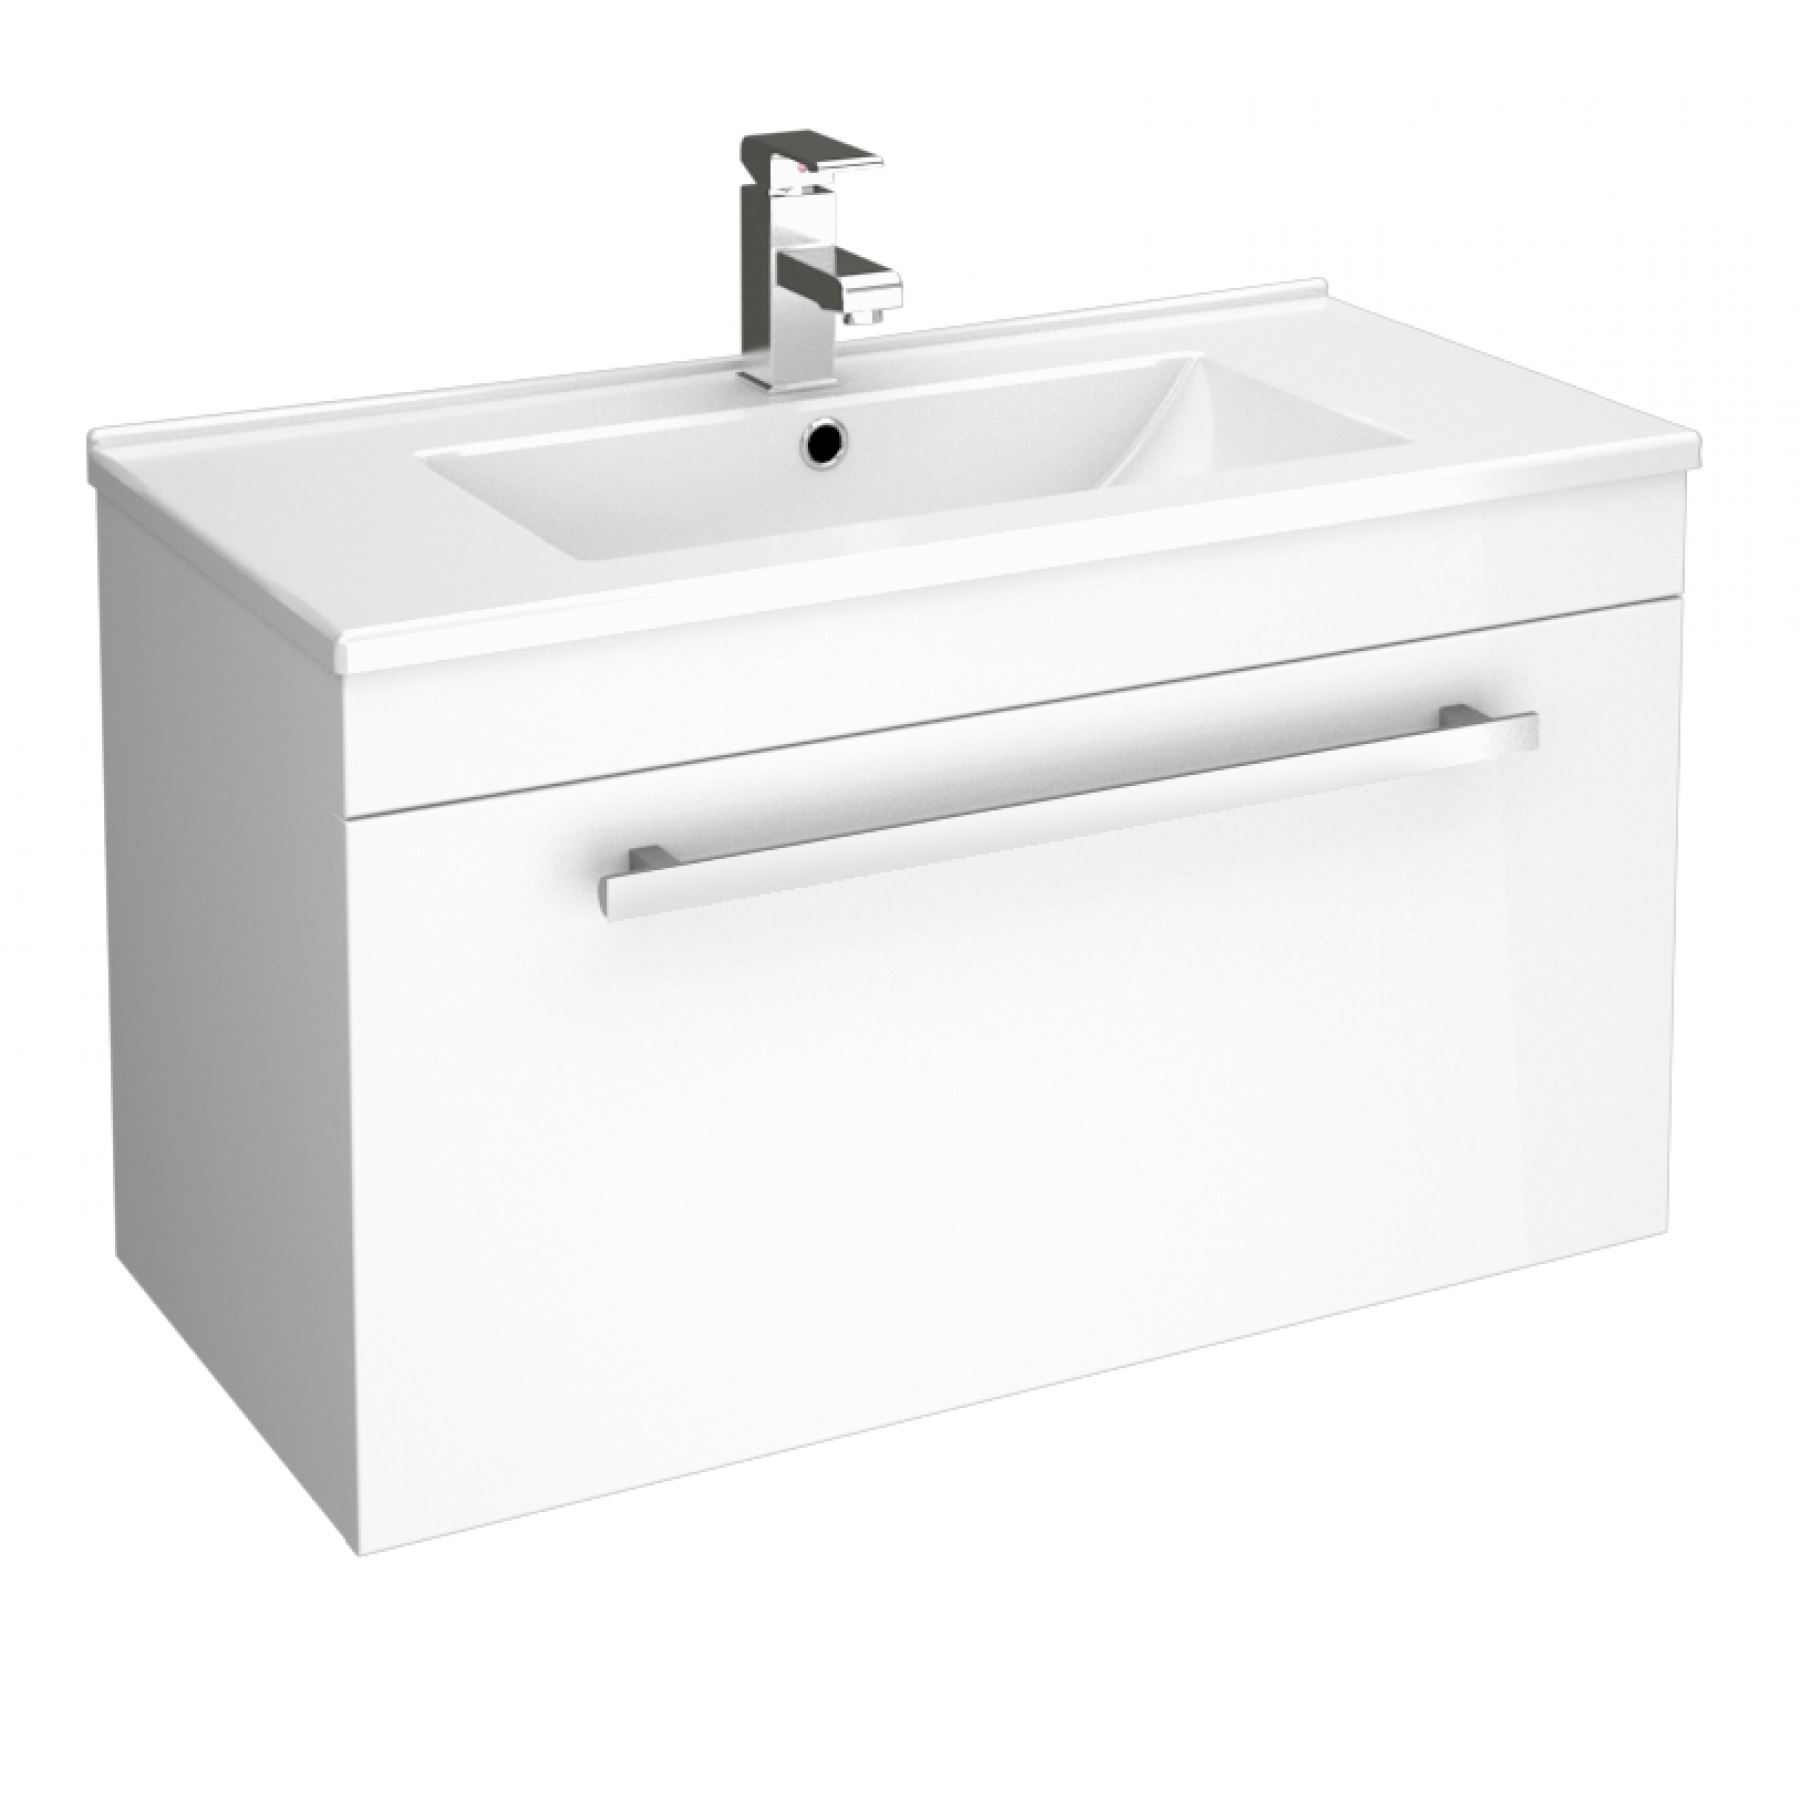 Wall Hung Sink Unit : Bathroom Storage Wall Hung Vanity Unit Cloakroom Cabinet Dropdown Sink ...